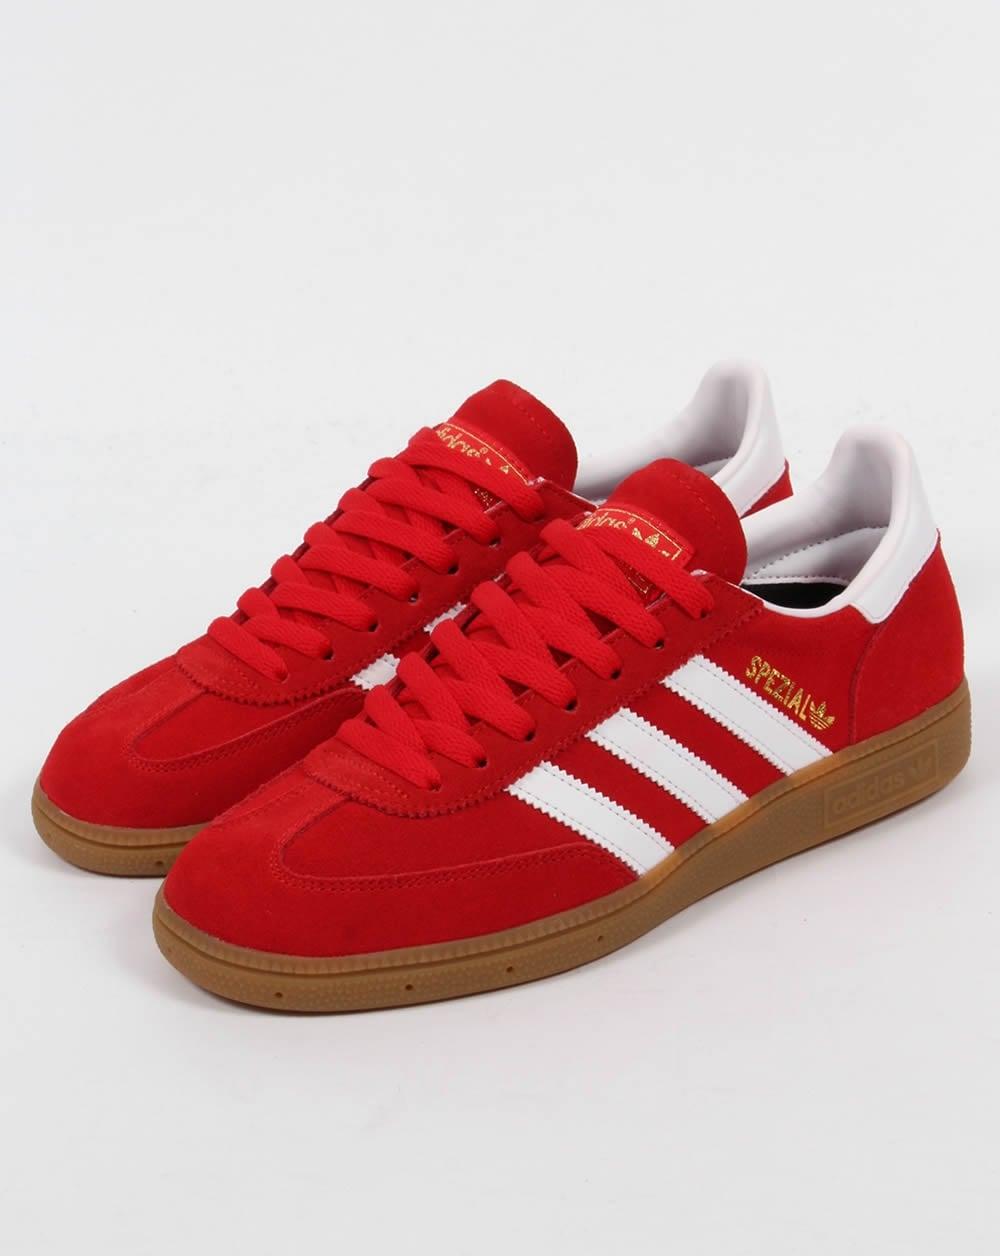 Ideas Clarks Salton Step Decorating Mens Suede Oxford Shoes